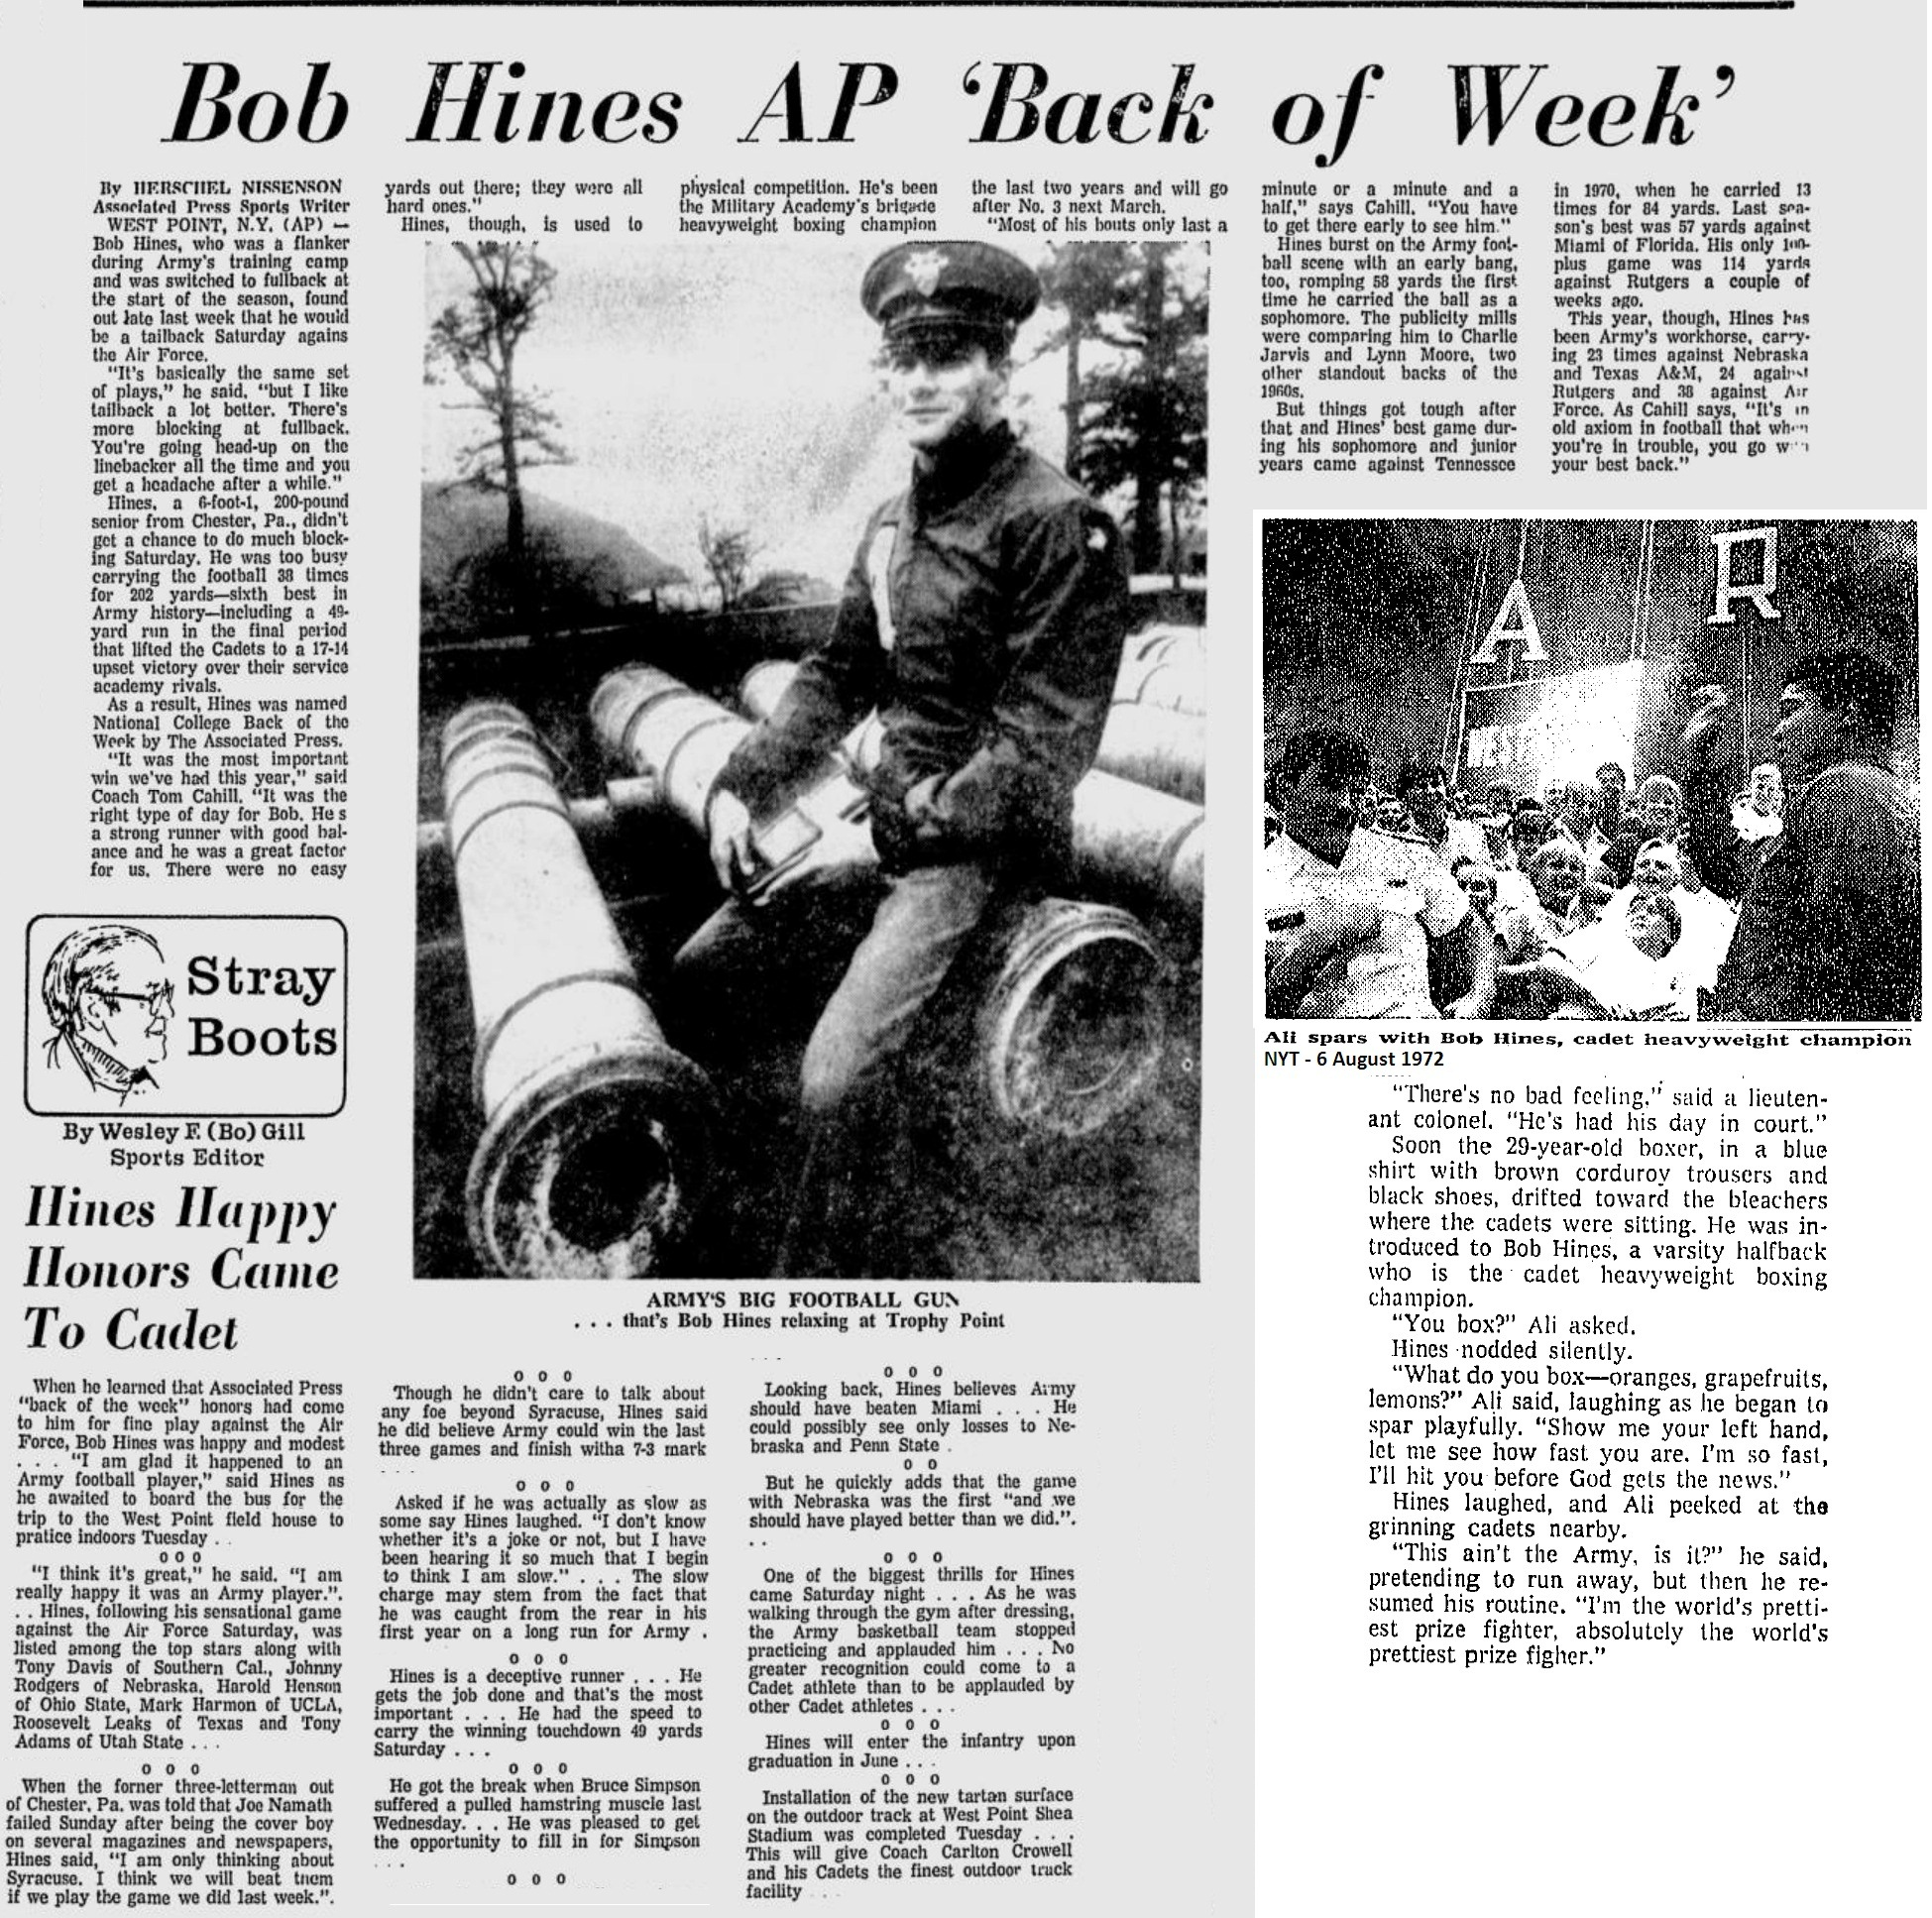 armyfb_1972_vsaf-bobhines-backofweek_eveningnews_nov81972